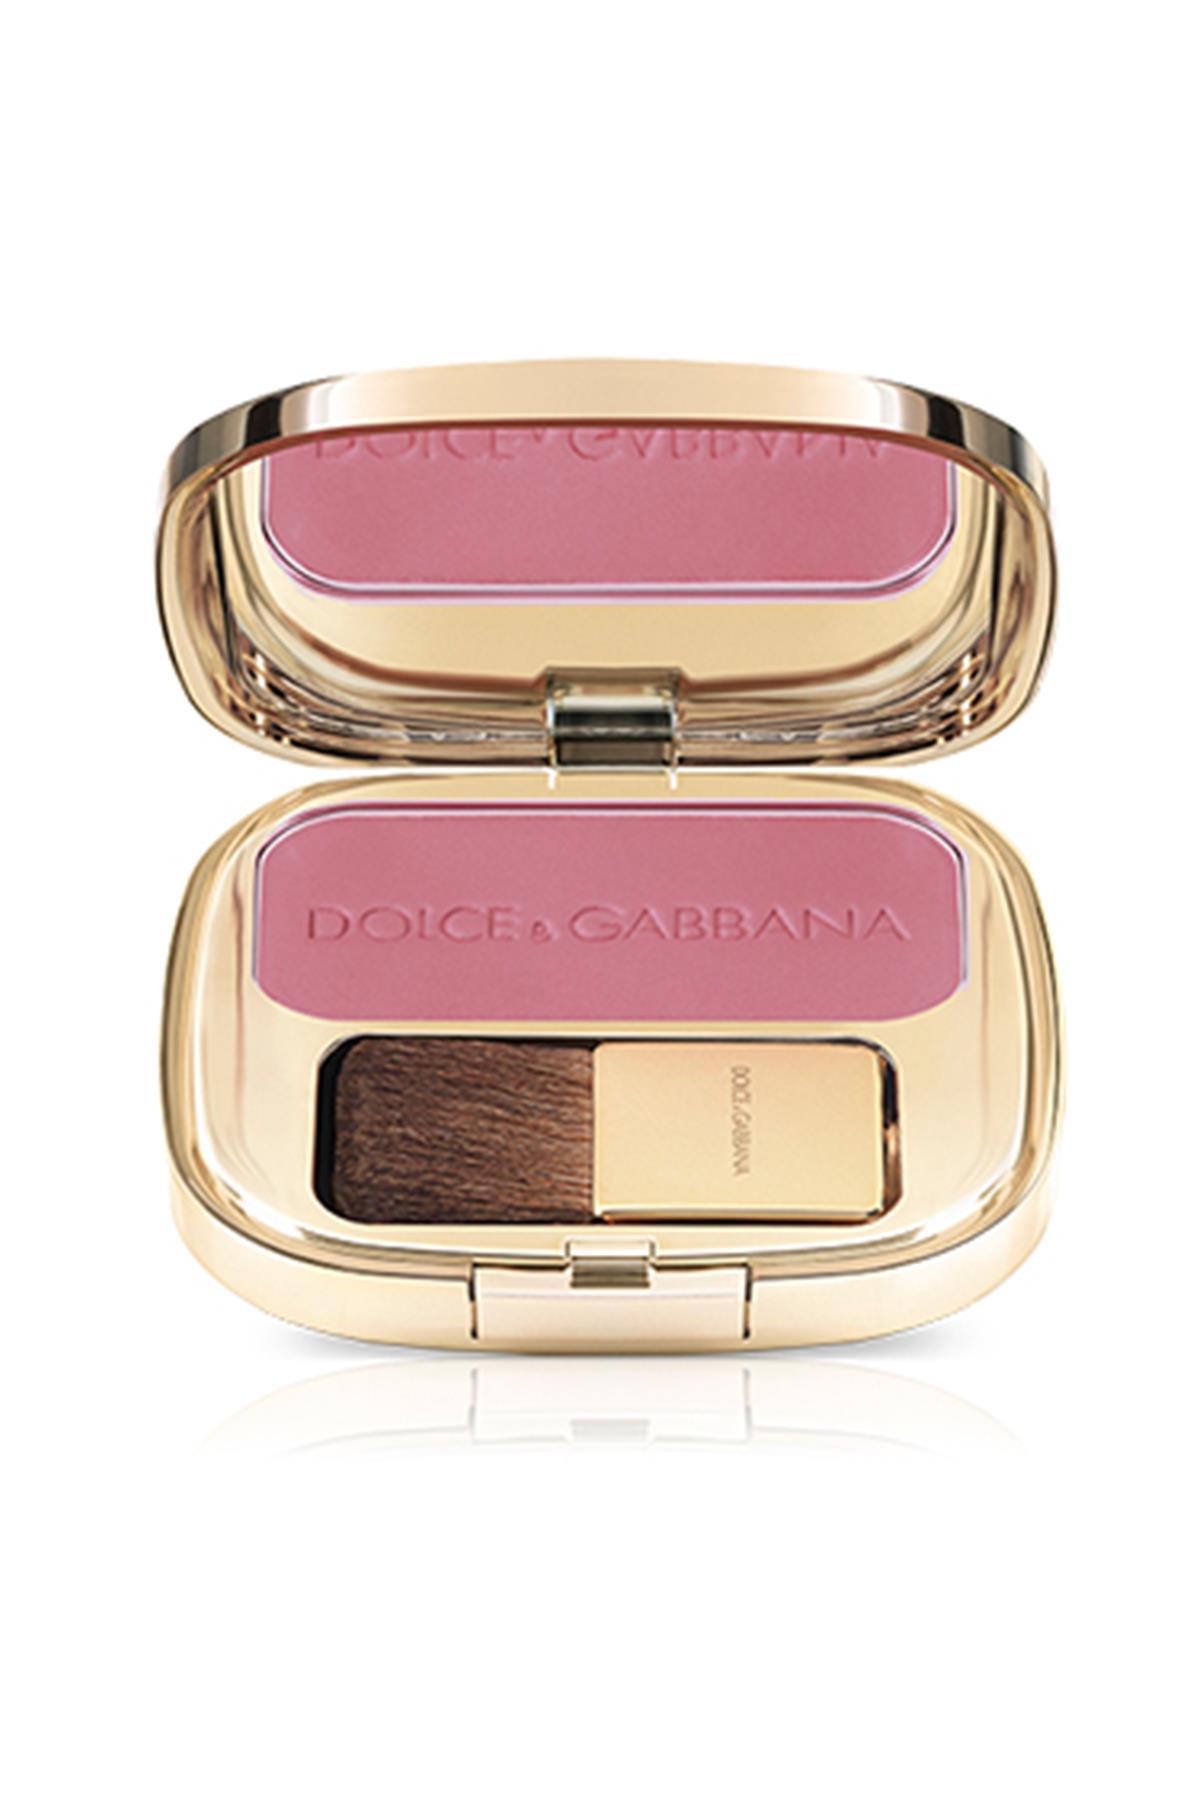 Dolce Gabbana The Blush Luminous Cheek Colour Allık 38 Mauve Diamond